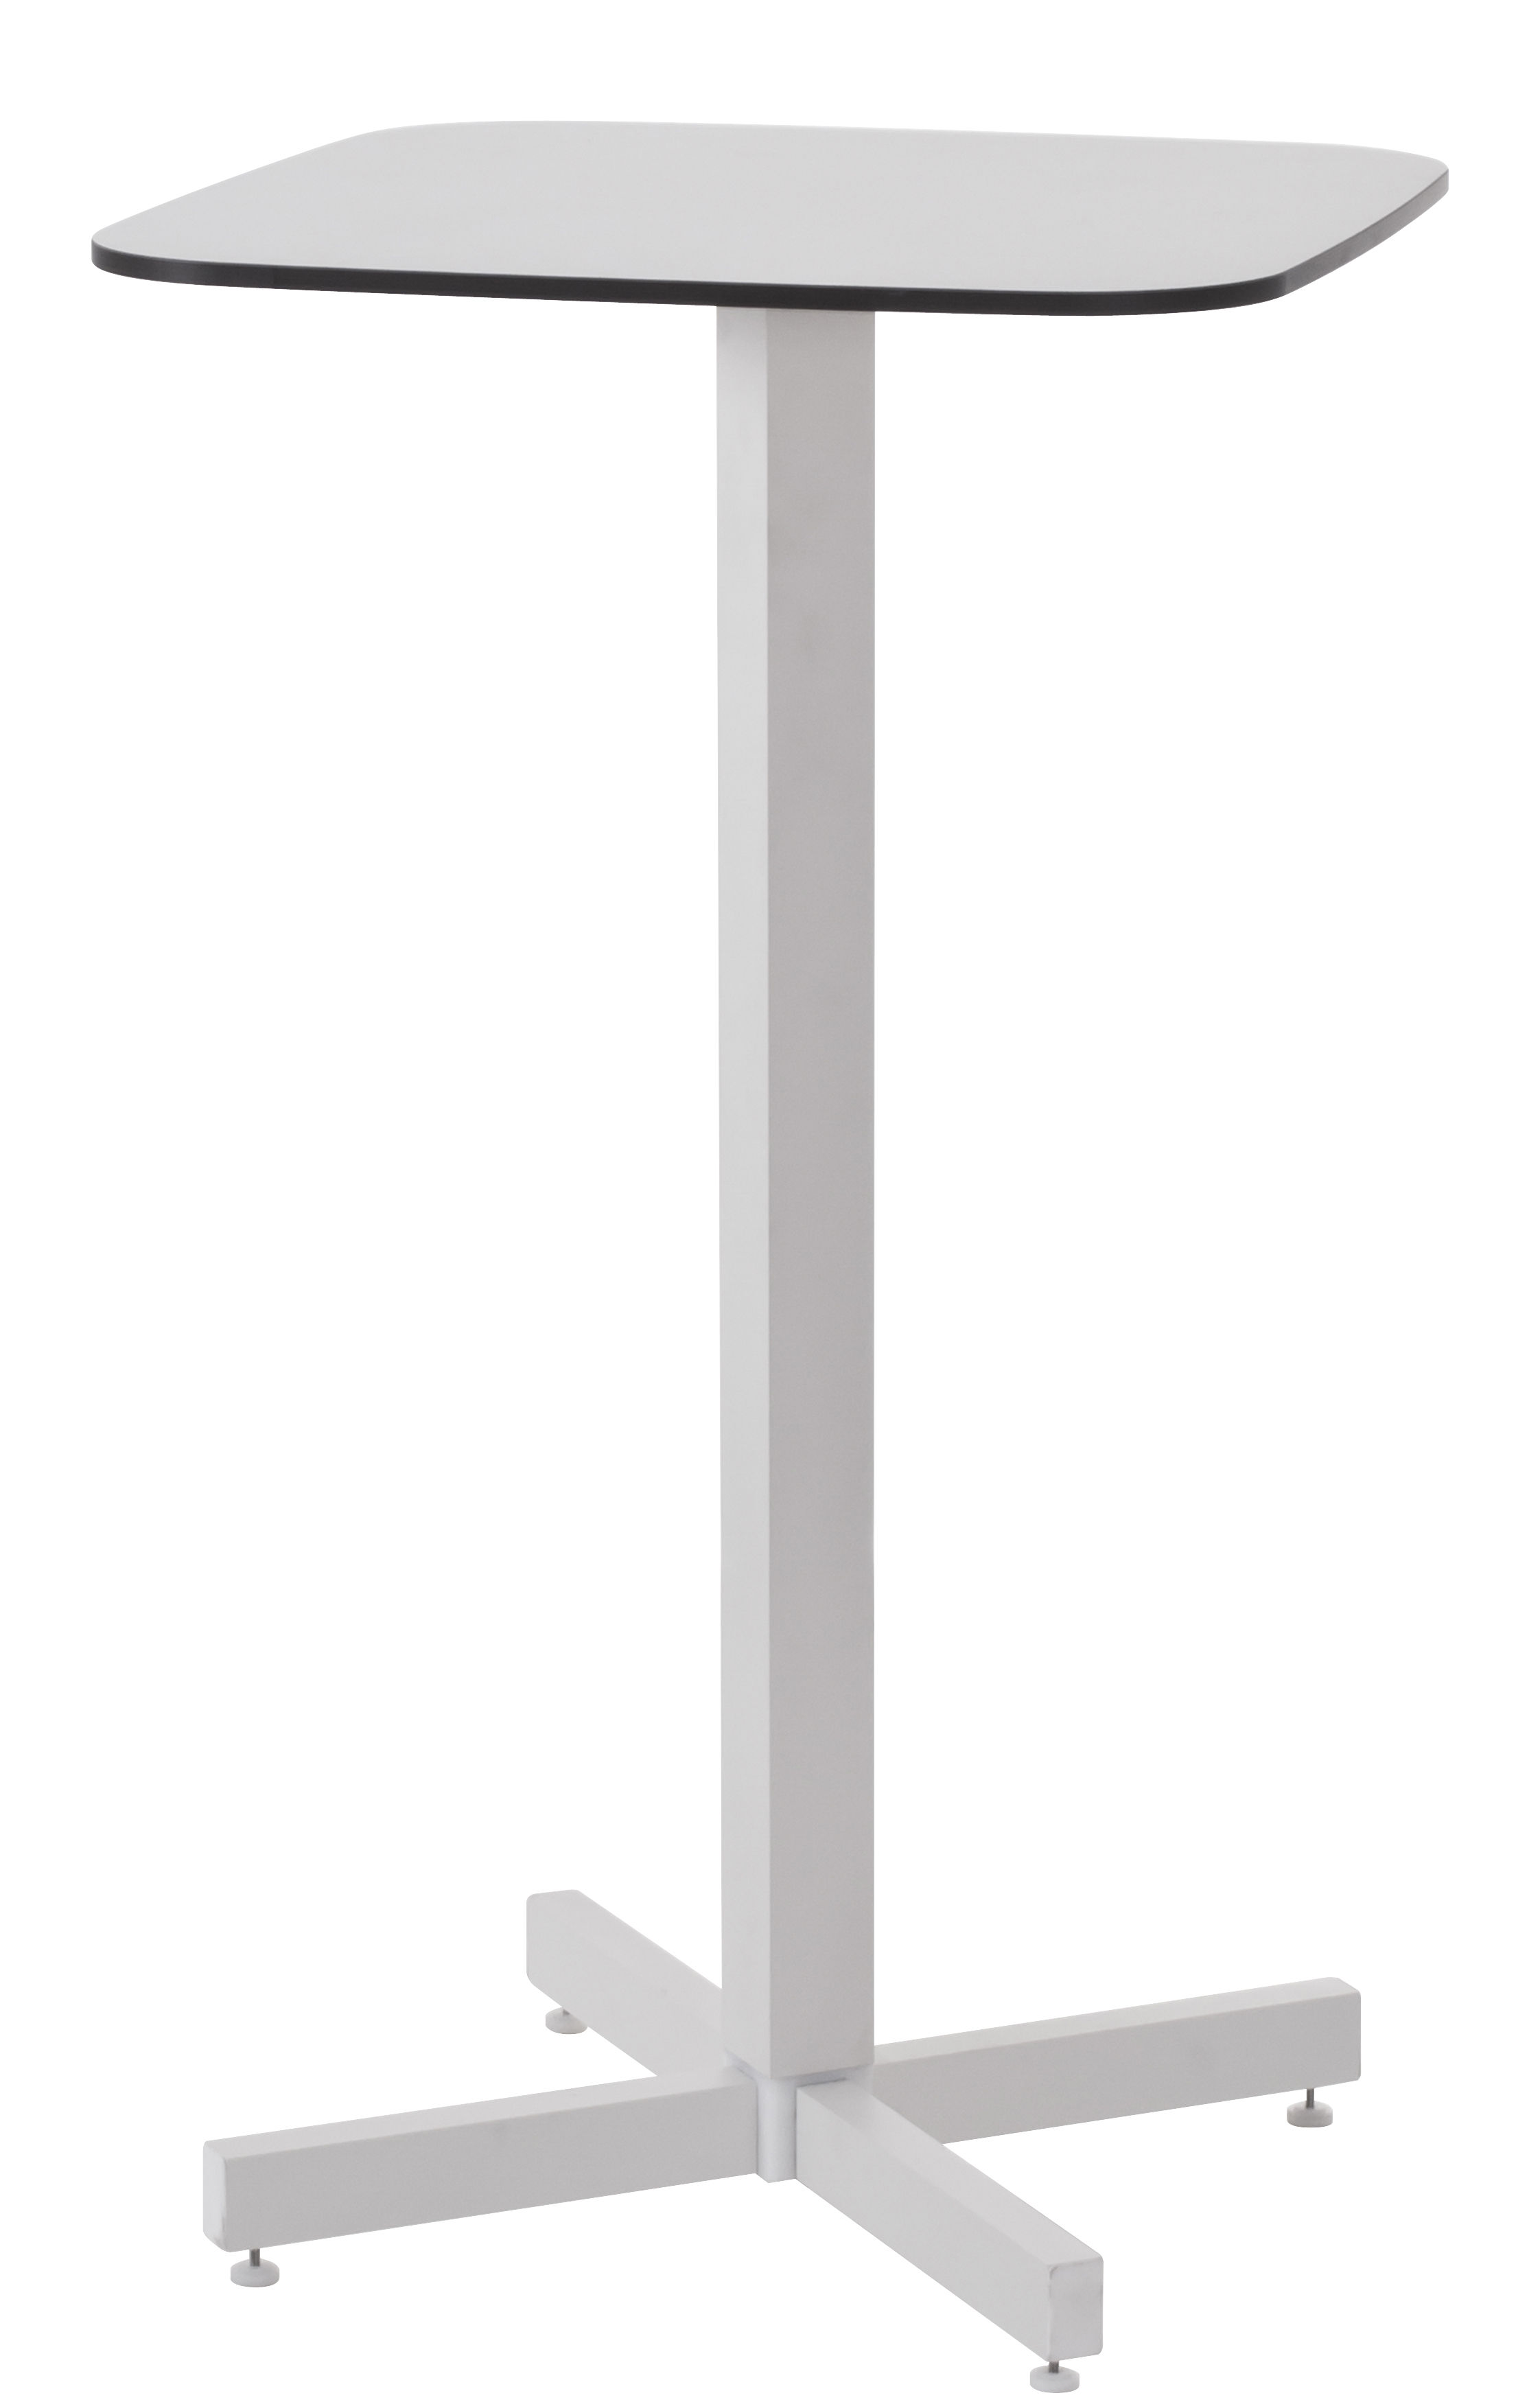 Mobilier - Mange-debout et bars - Mange-debout Shine / H 105 cm - Emu - Blanc - Aluminium verni, HPL